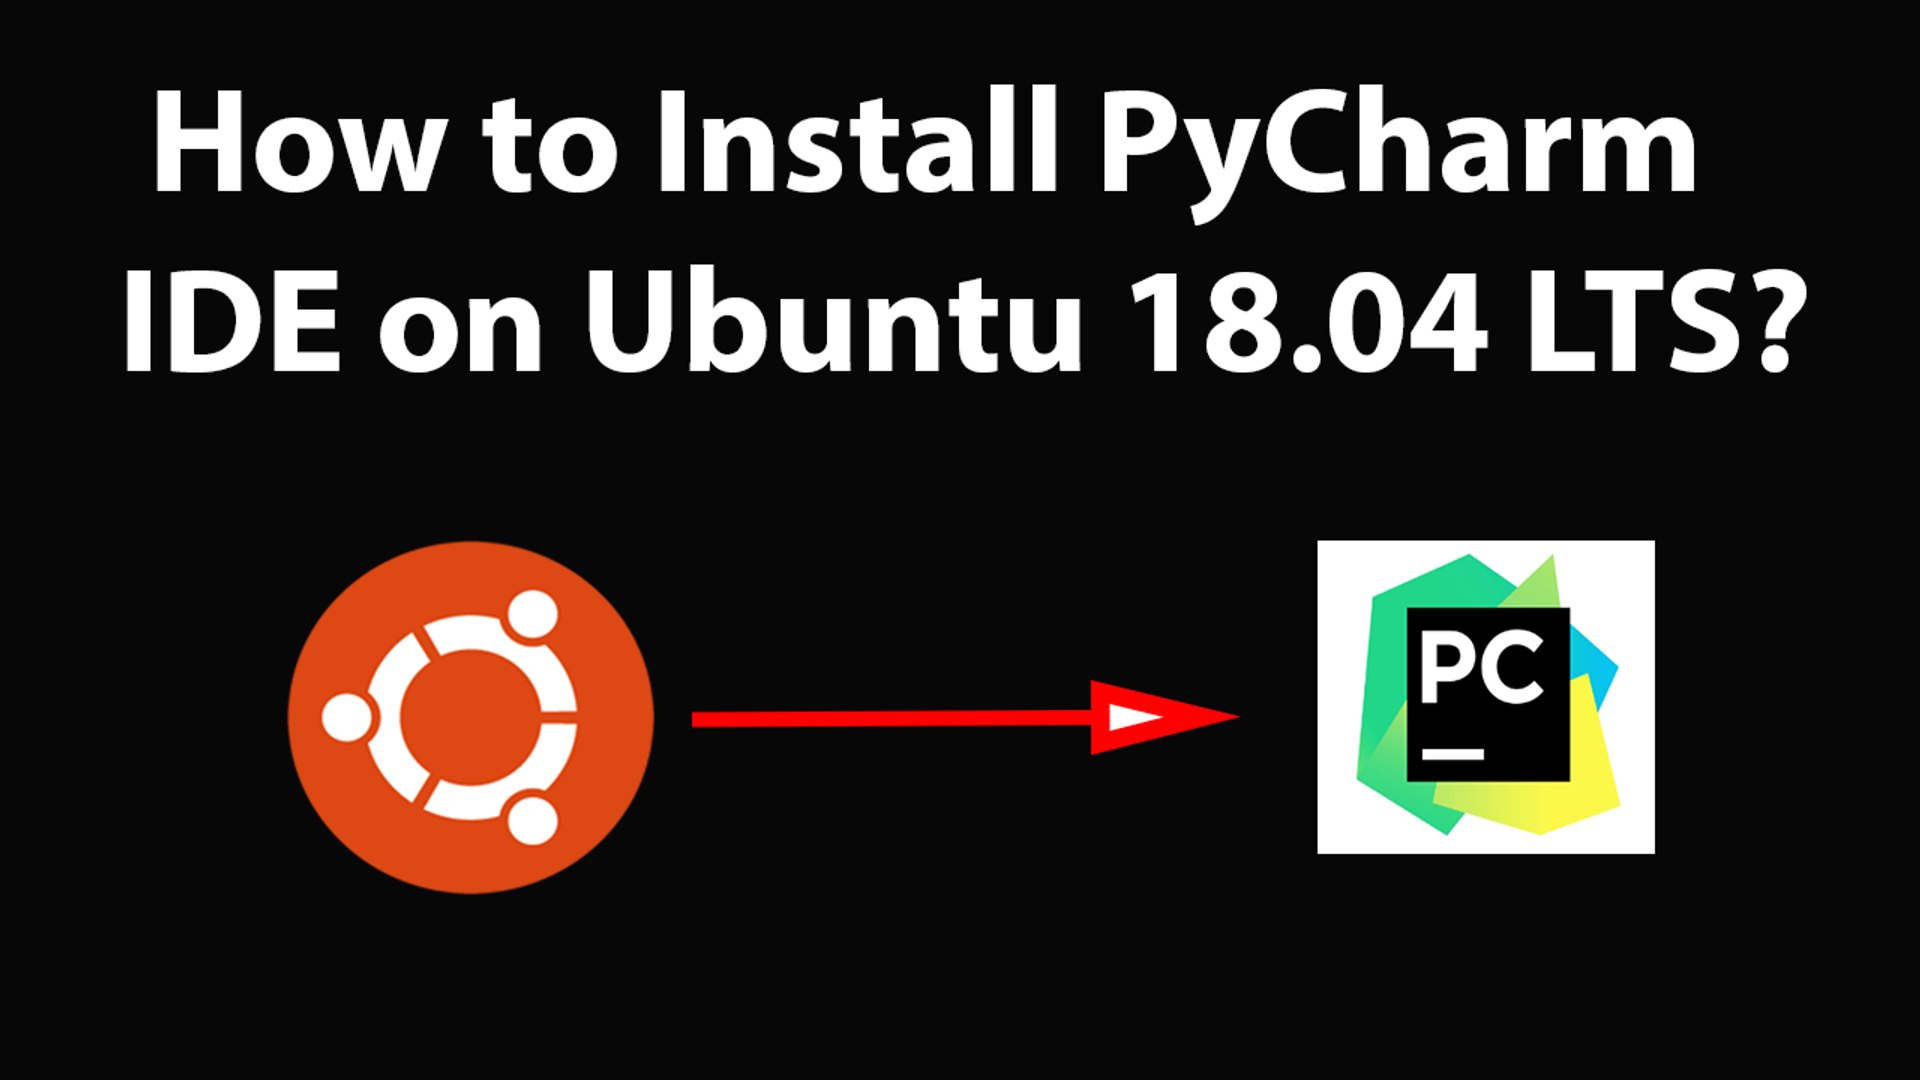 How to Install PyCharm IDE on Ubuntu 18 04 LTS?